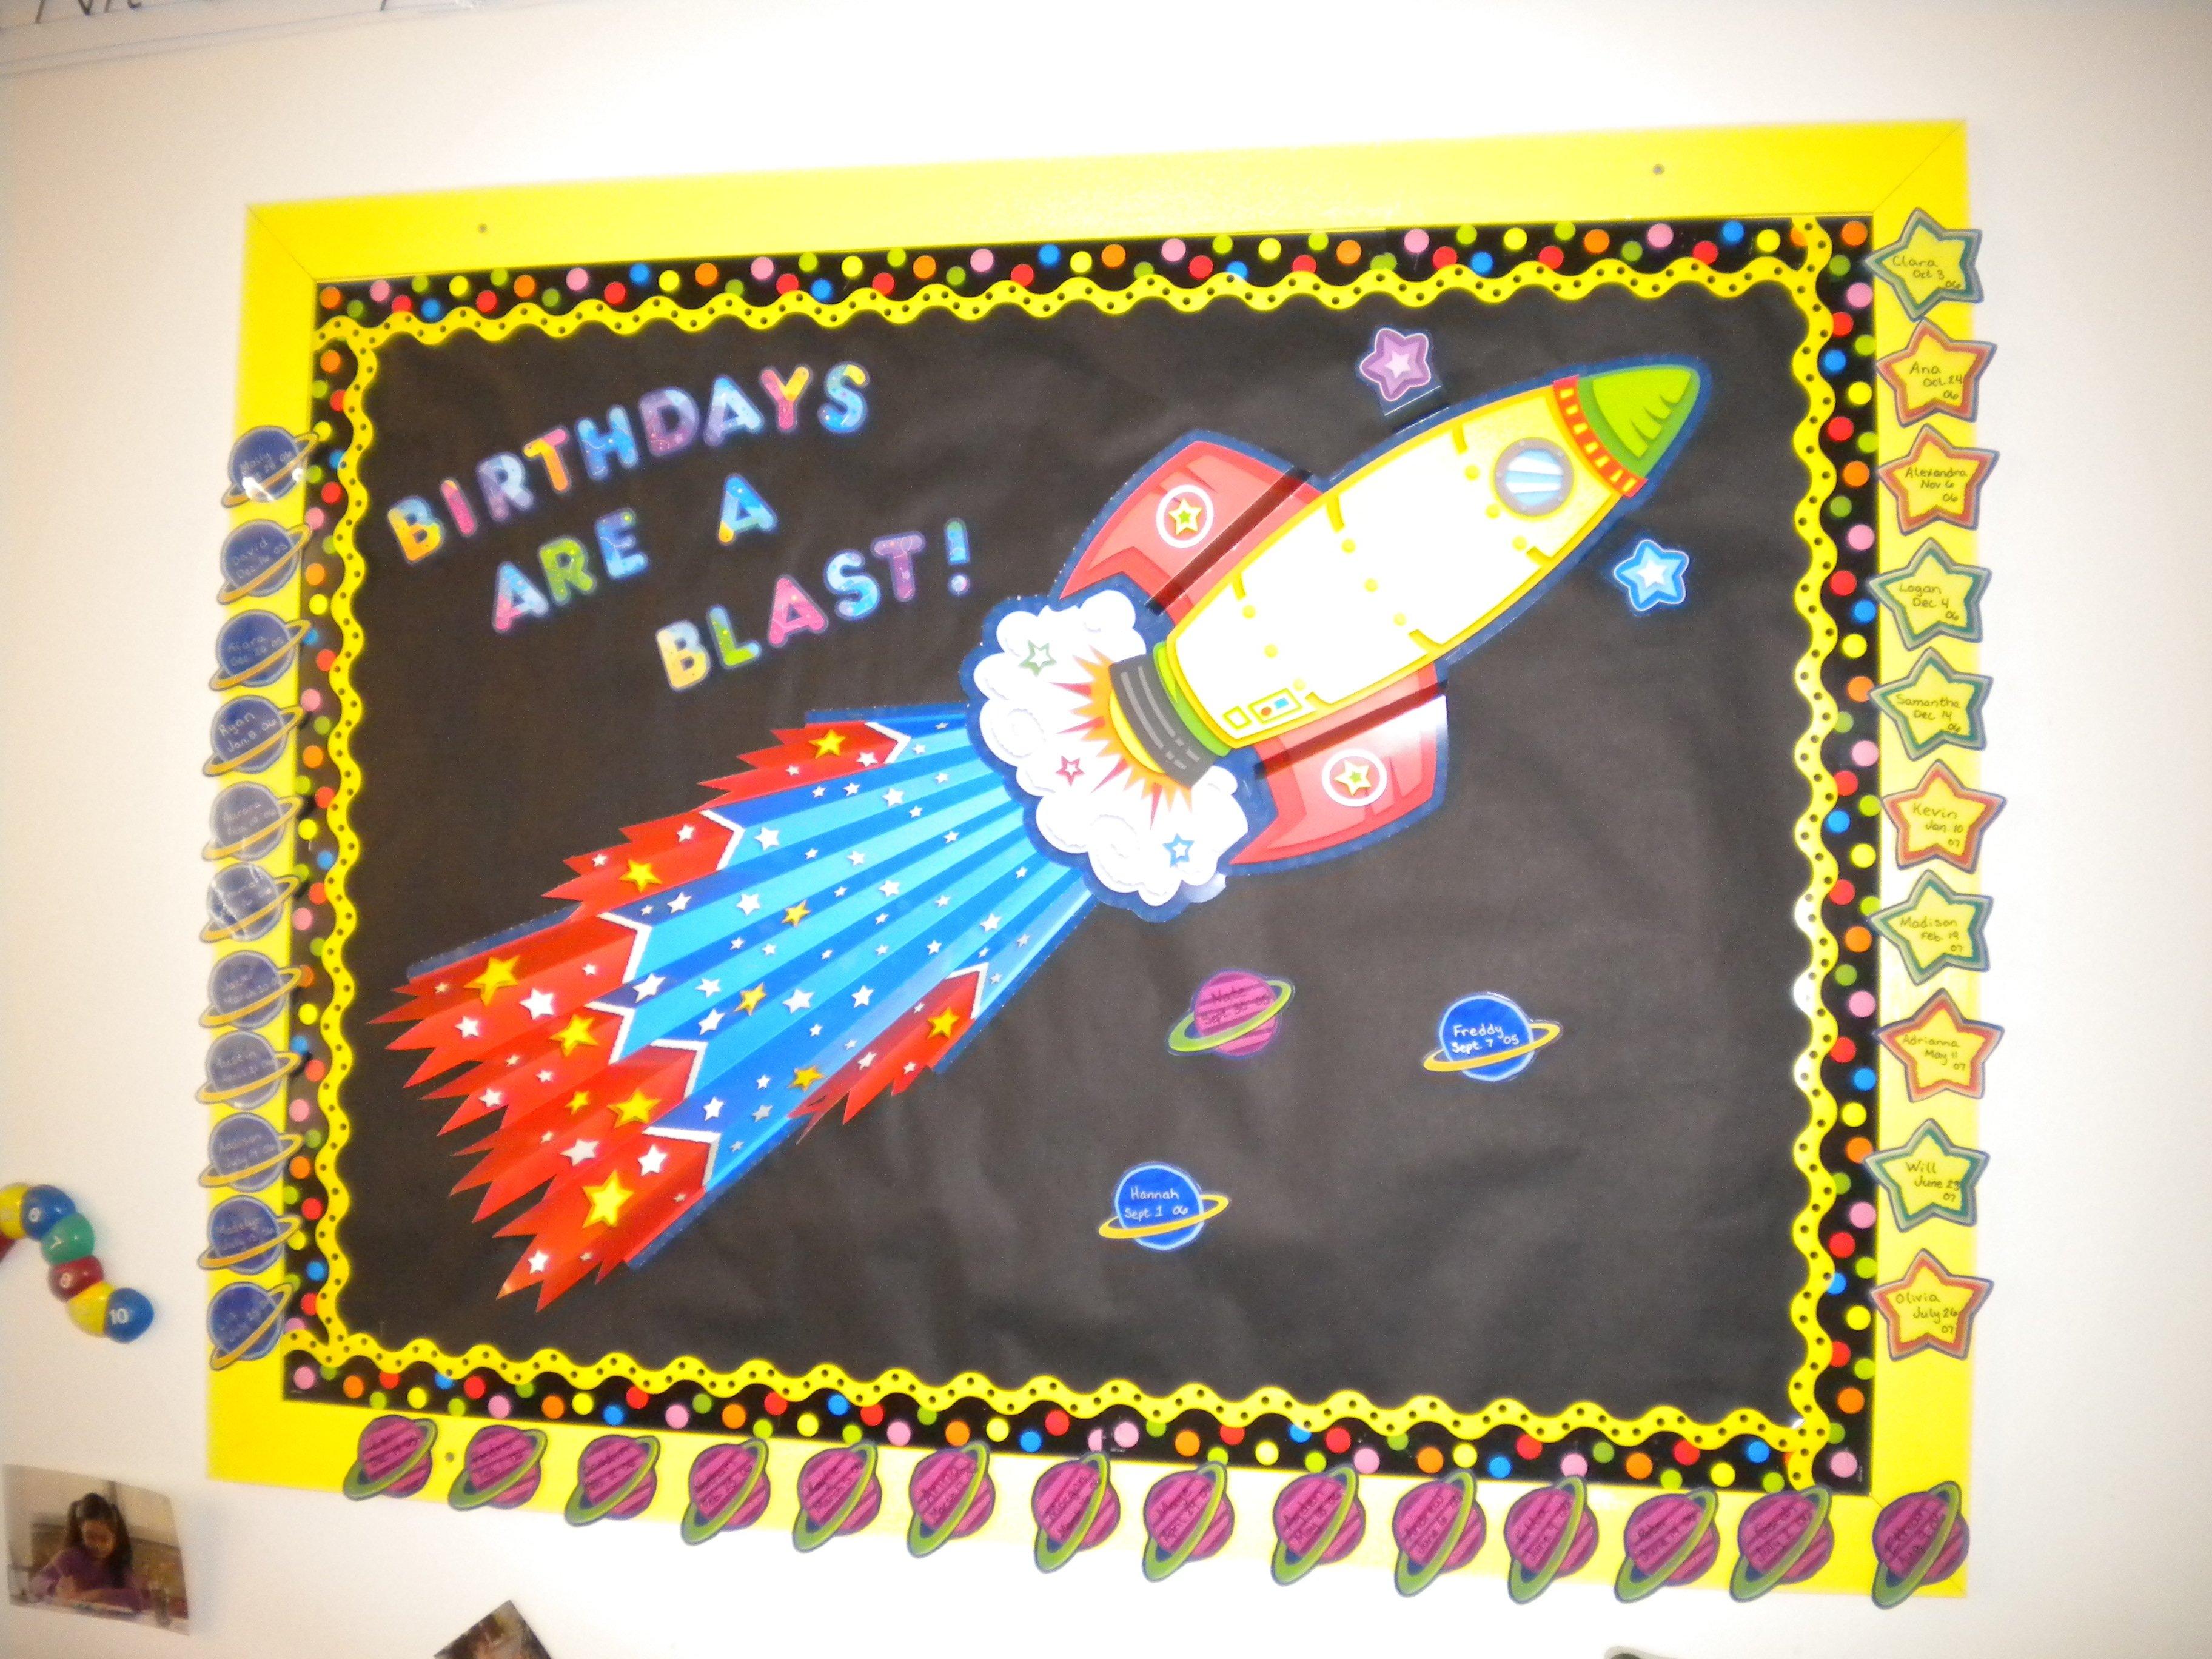 10 Wonderful Happy Birthday Bulletin Board Ideas bunches of bulletin boards preschool playtime 12 2020